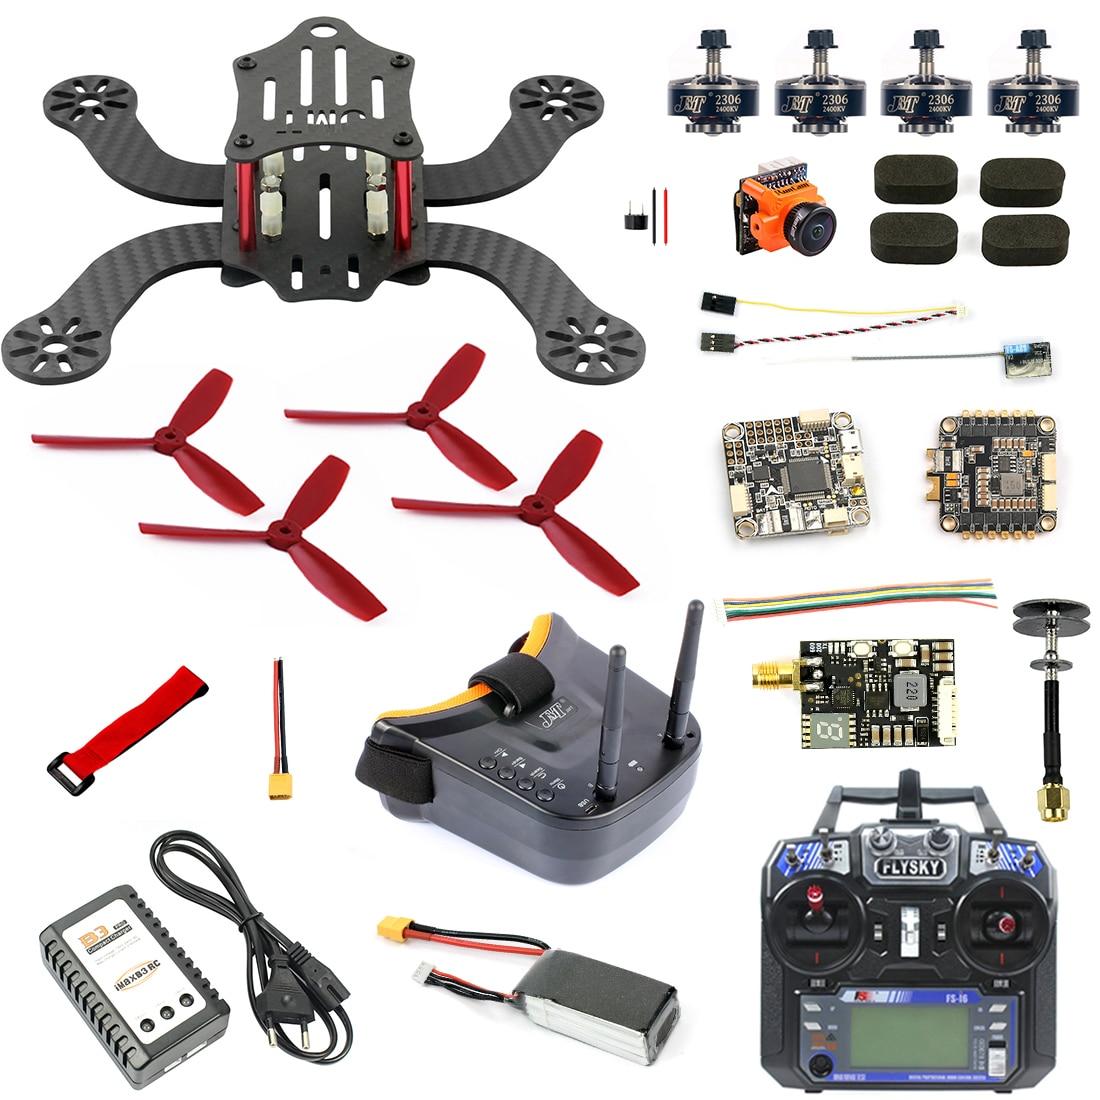 Drone quadrirotor de course Mini F4 Pro OSD RC FPV 194mm avec 4 en 1 30A ESC RunCam 600TVL/700TVL BNF RTFDrone quadrirotor de course Mini F4 Pro OSD RC FPV 194mm avec 4 en 1 30A ESC RunCam 600TVL/700TVL BNF RTF